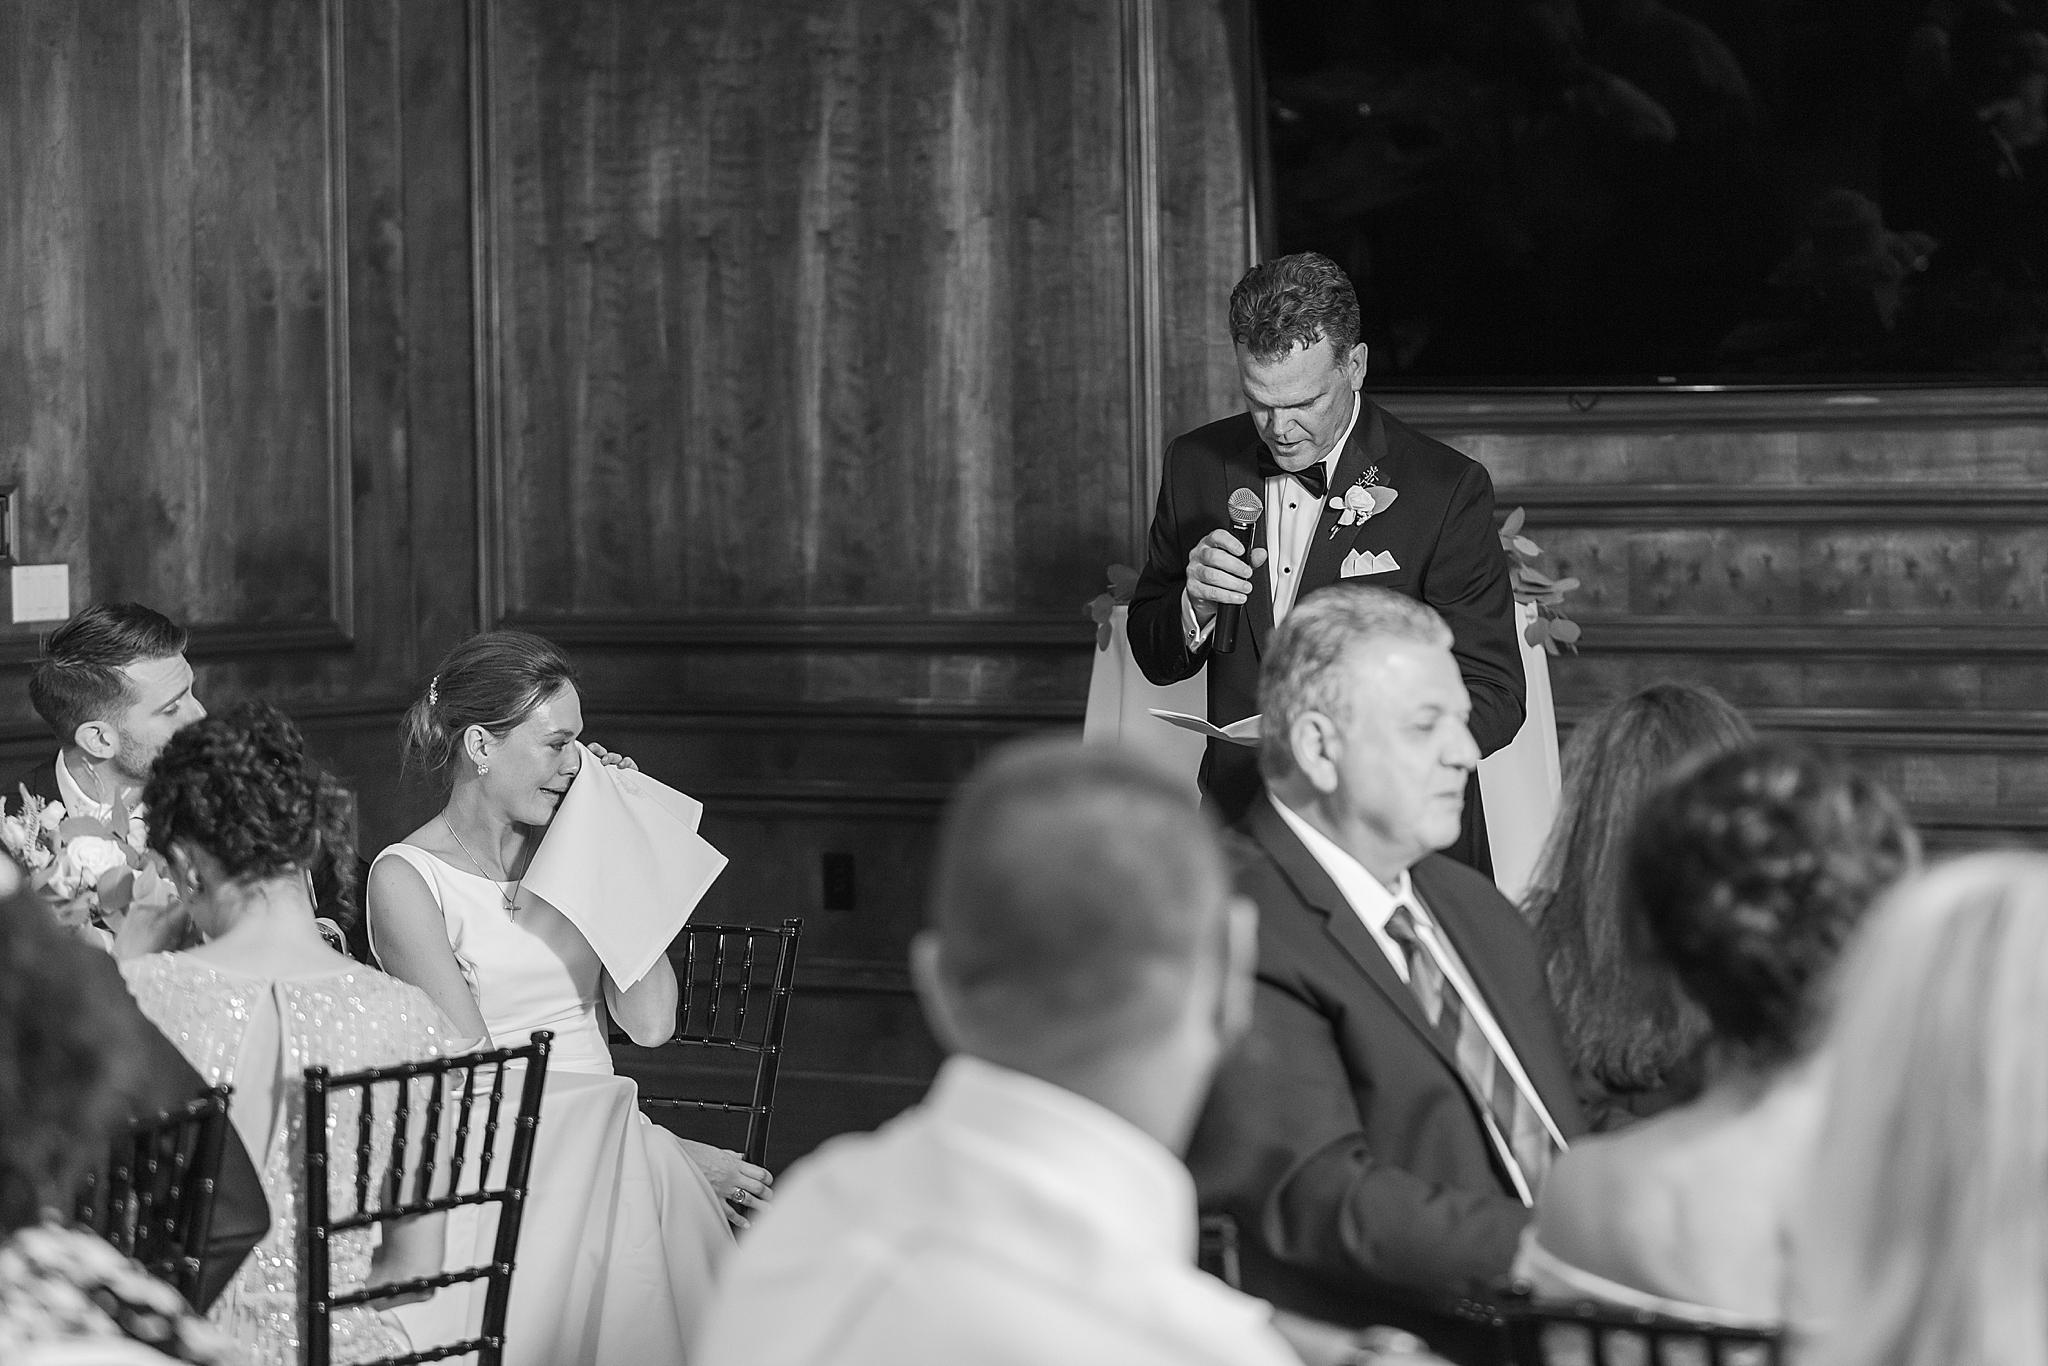 detroit-wedding-photographer-grosse-pointe-academy-chapel-detroit-golf-club-wedding-carly-matt-by-courtney-carolyn-photography_0095.jpg